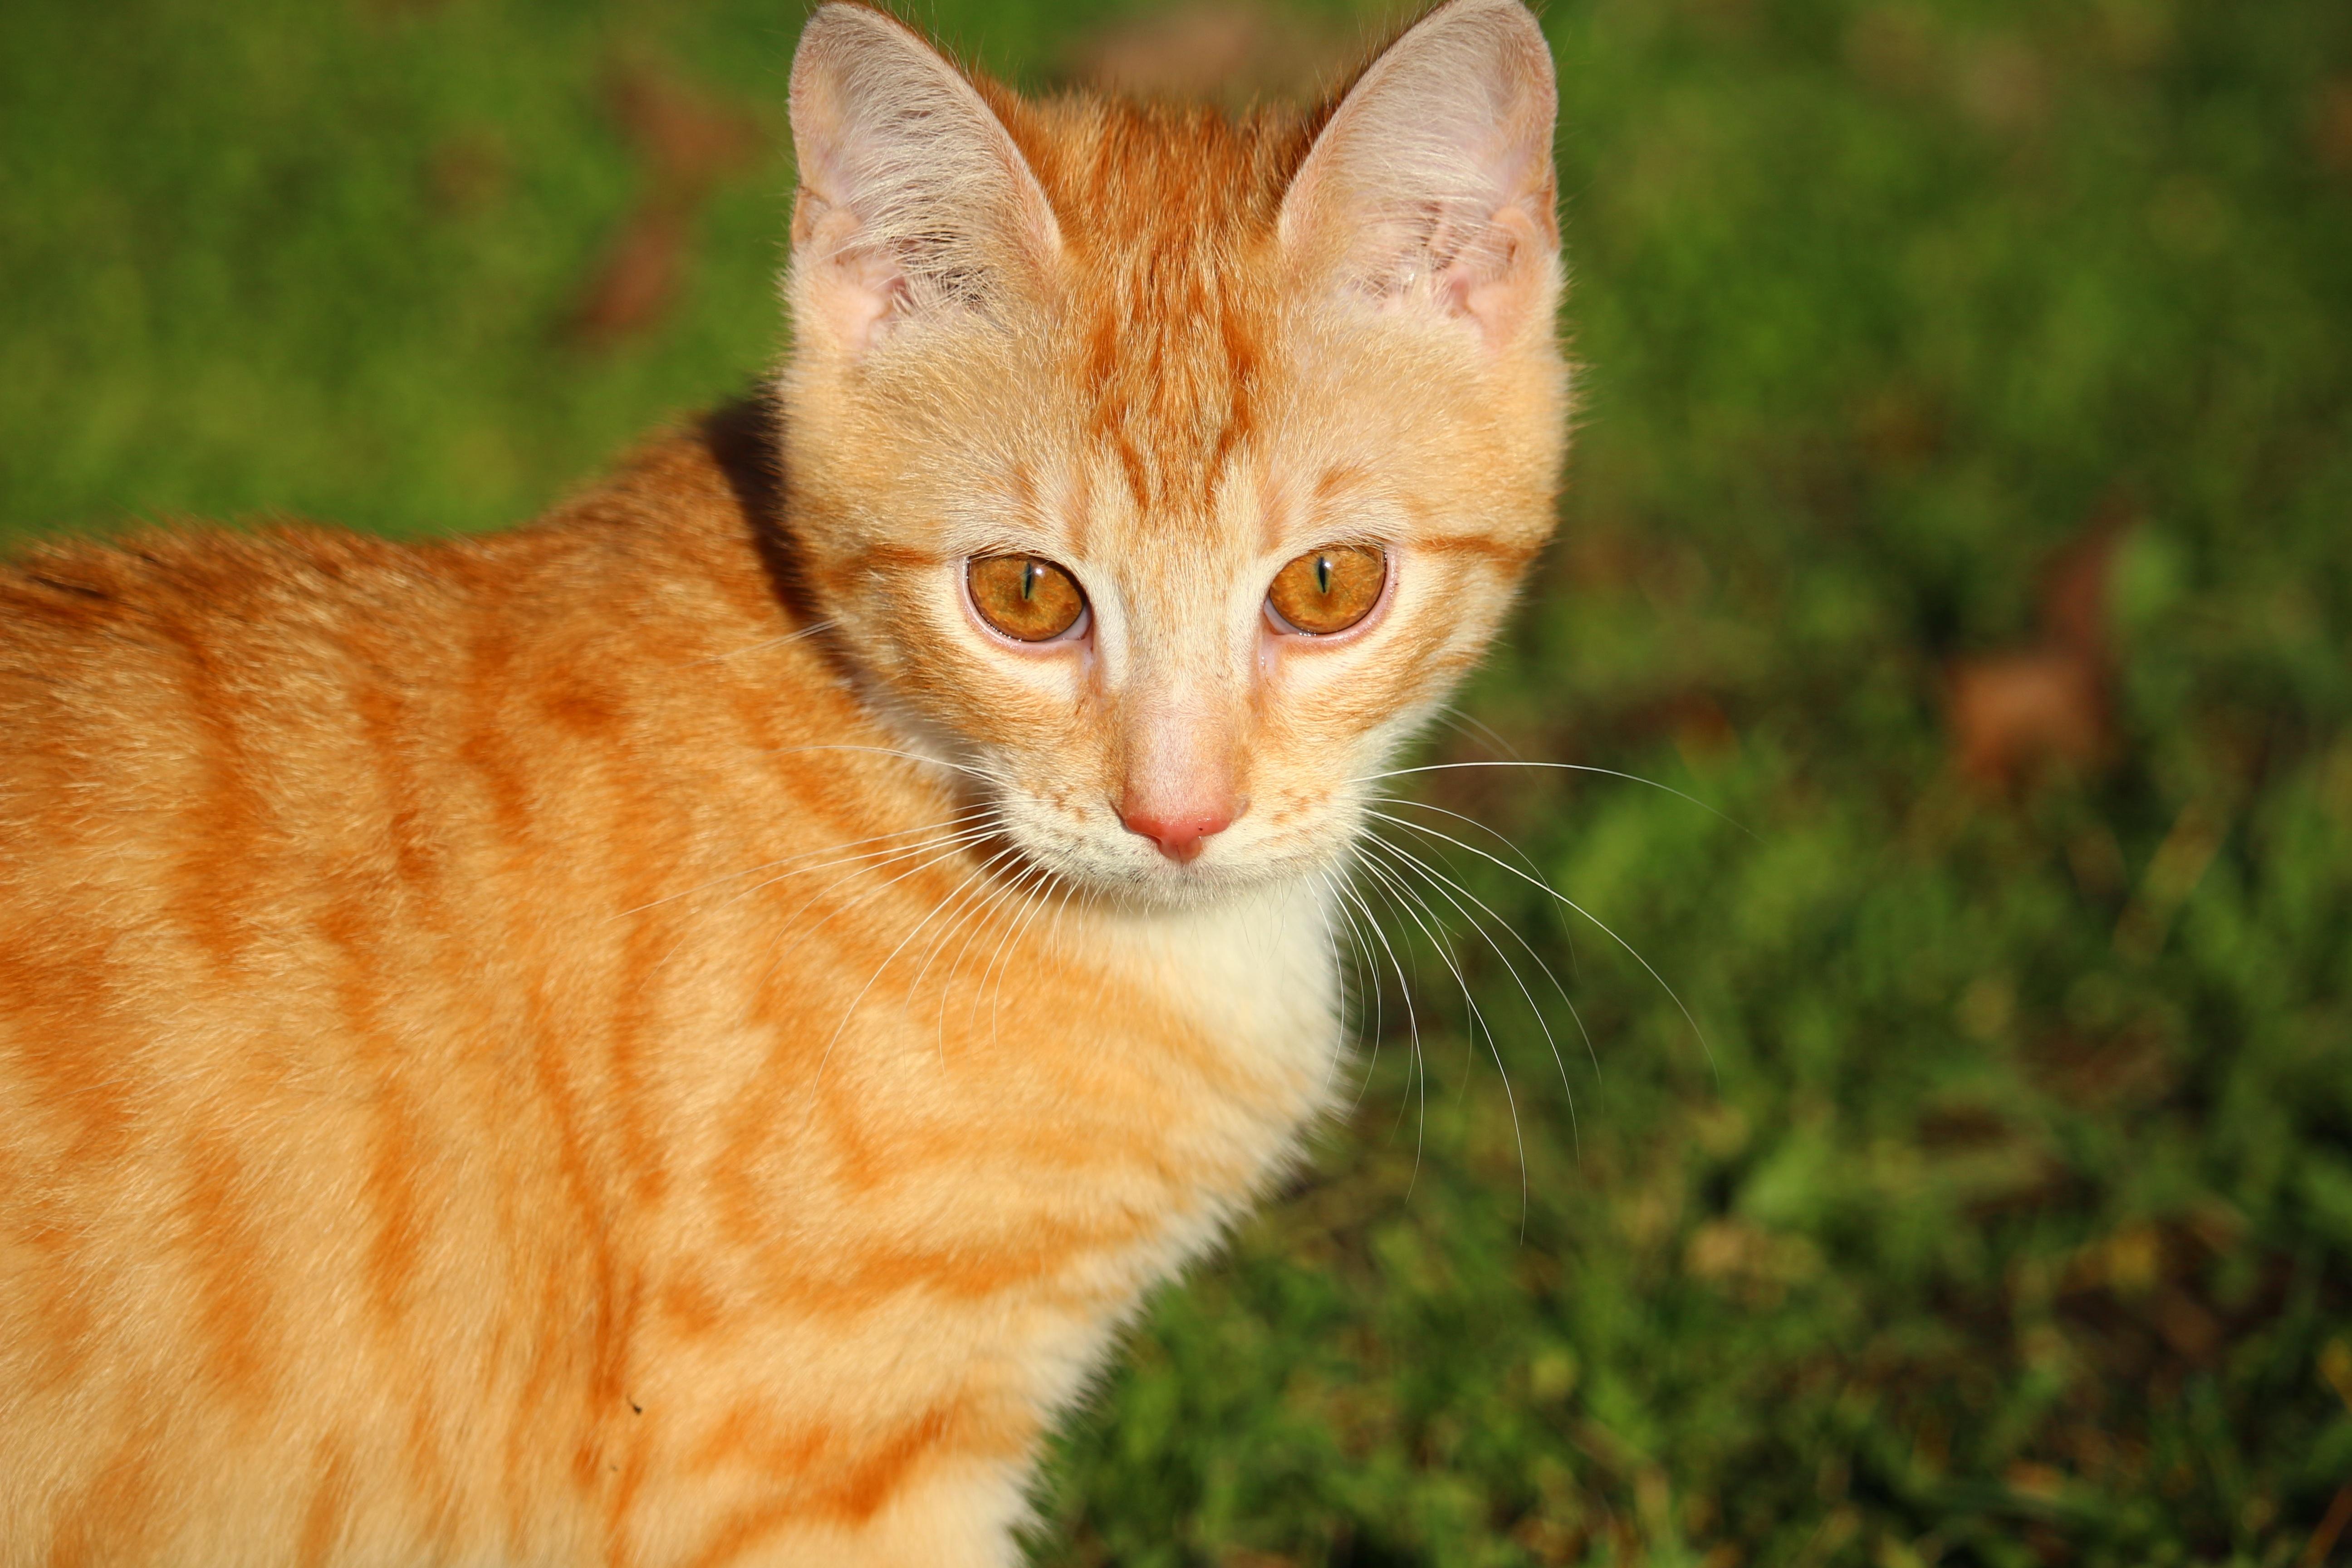 Free Images Grass Kitten Fauna Whiskers Savannah Vertebrate